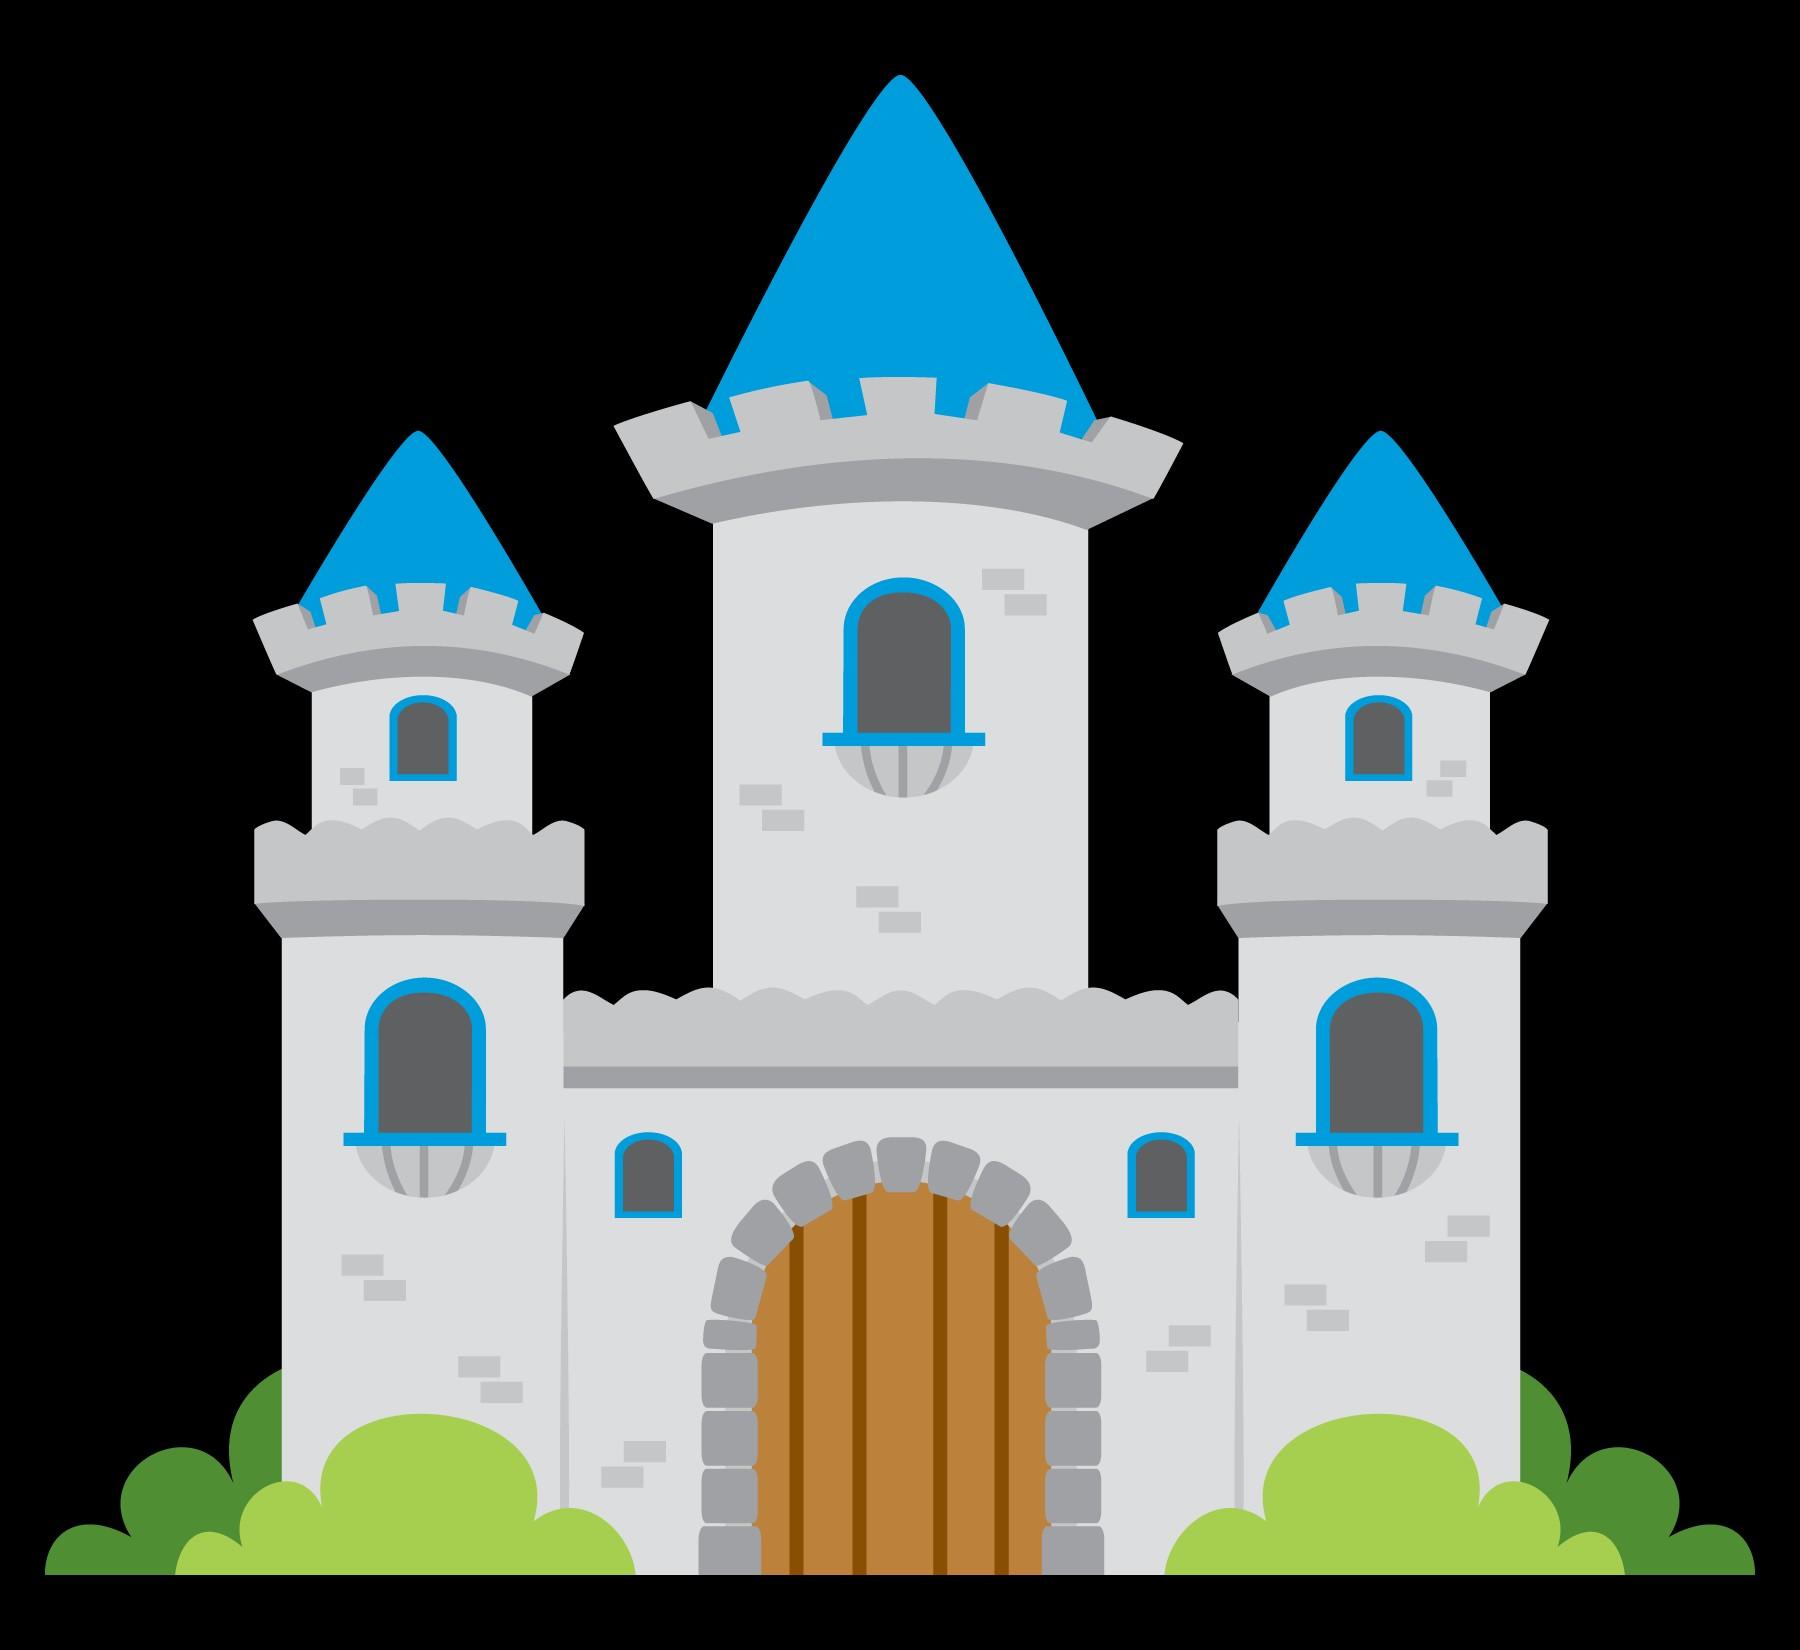 Castle clipart clip art. Free cliparts download